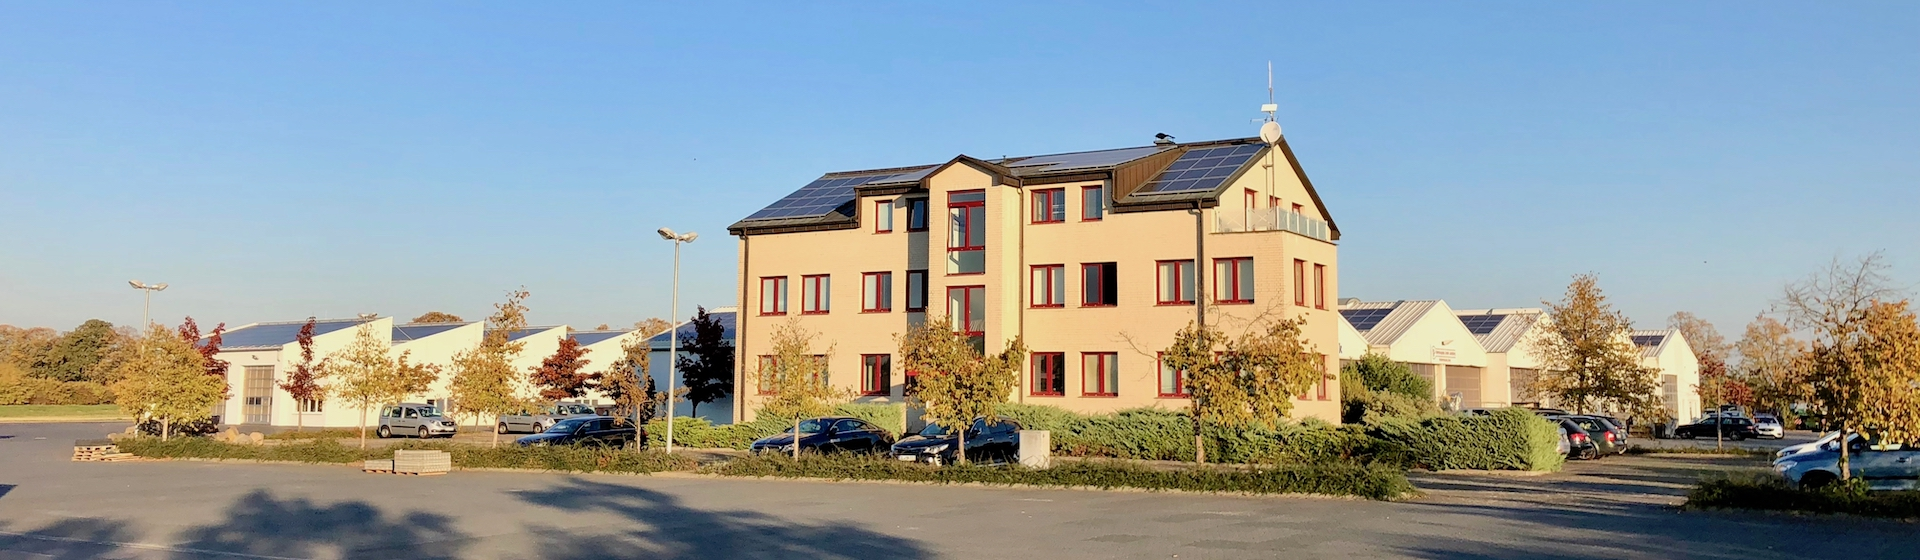 Abbildung Neumann Gruppe Firmensitz in Burg